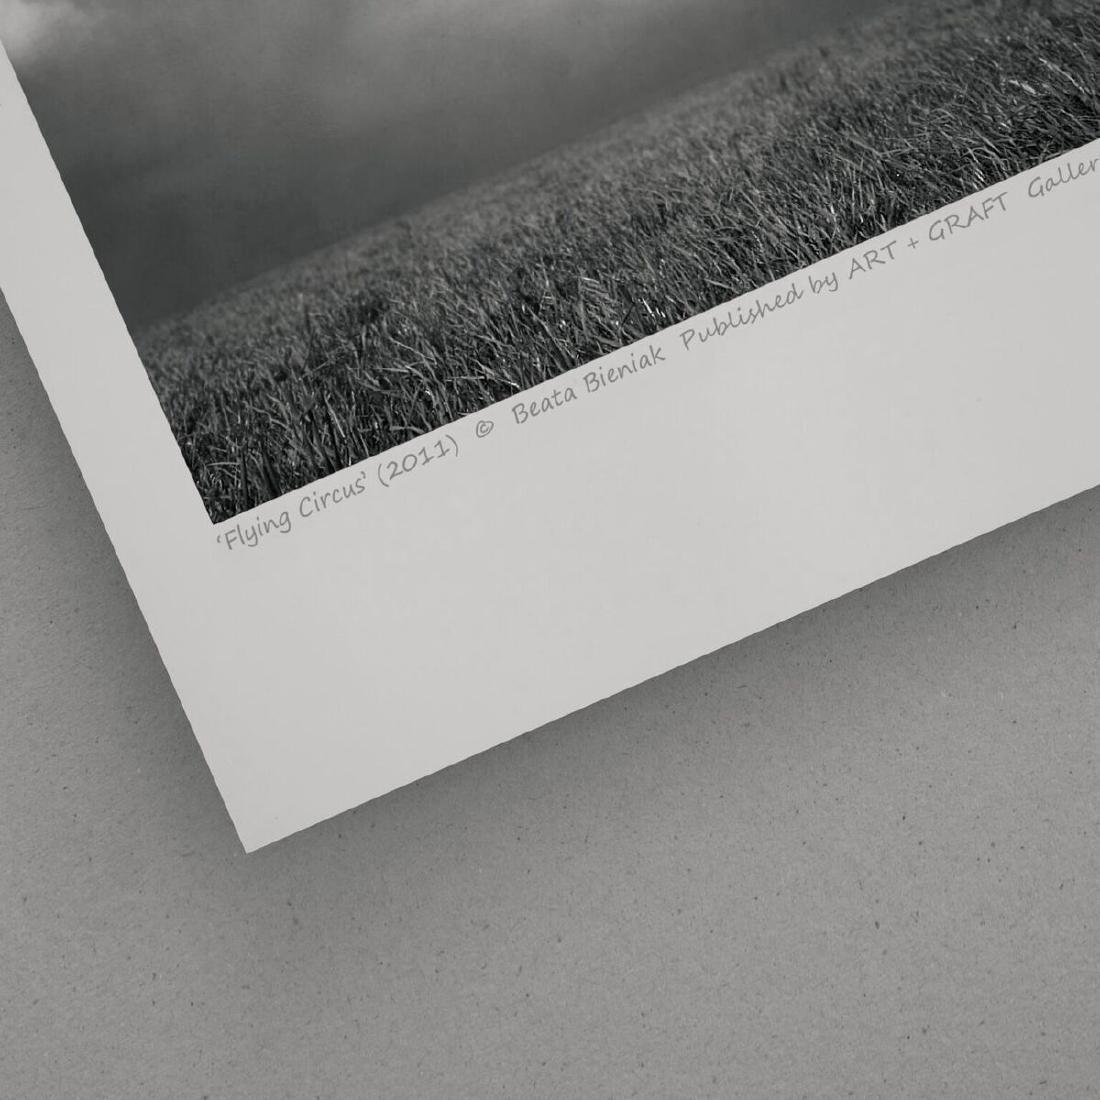 Beata Bieniak Chromogenic Print Flying Circus - 4